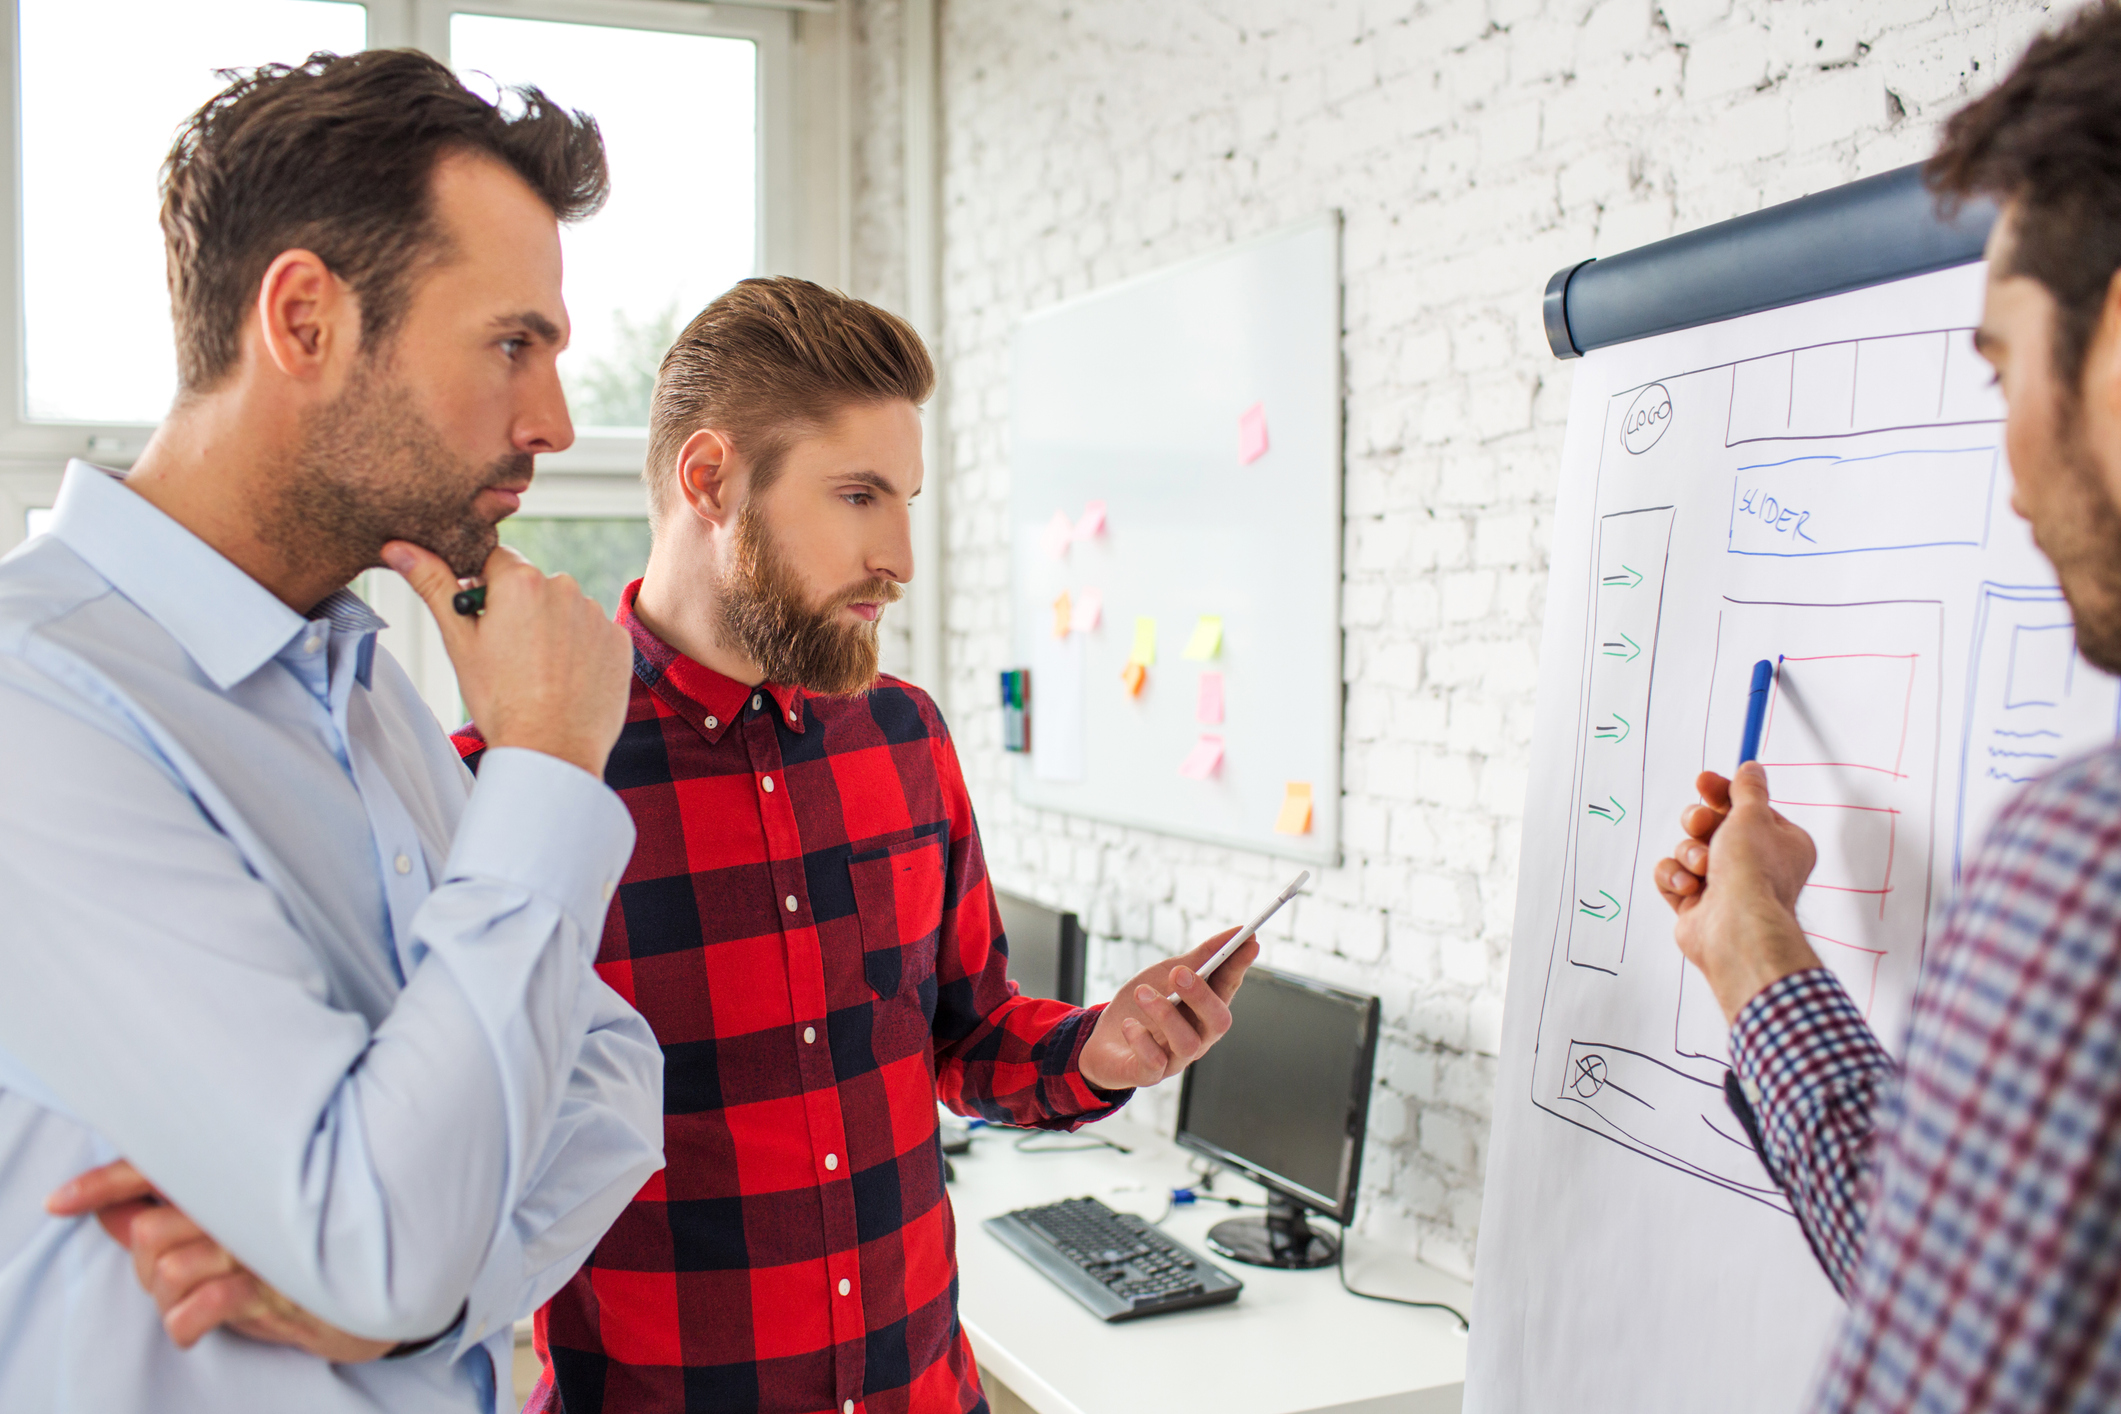 Web designers planning a website